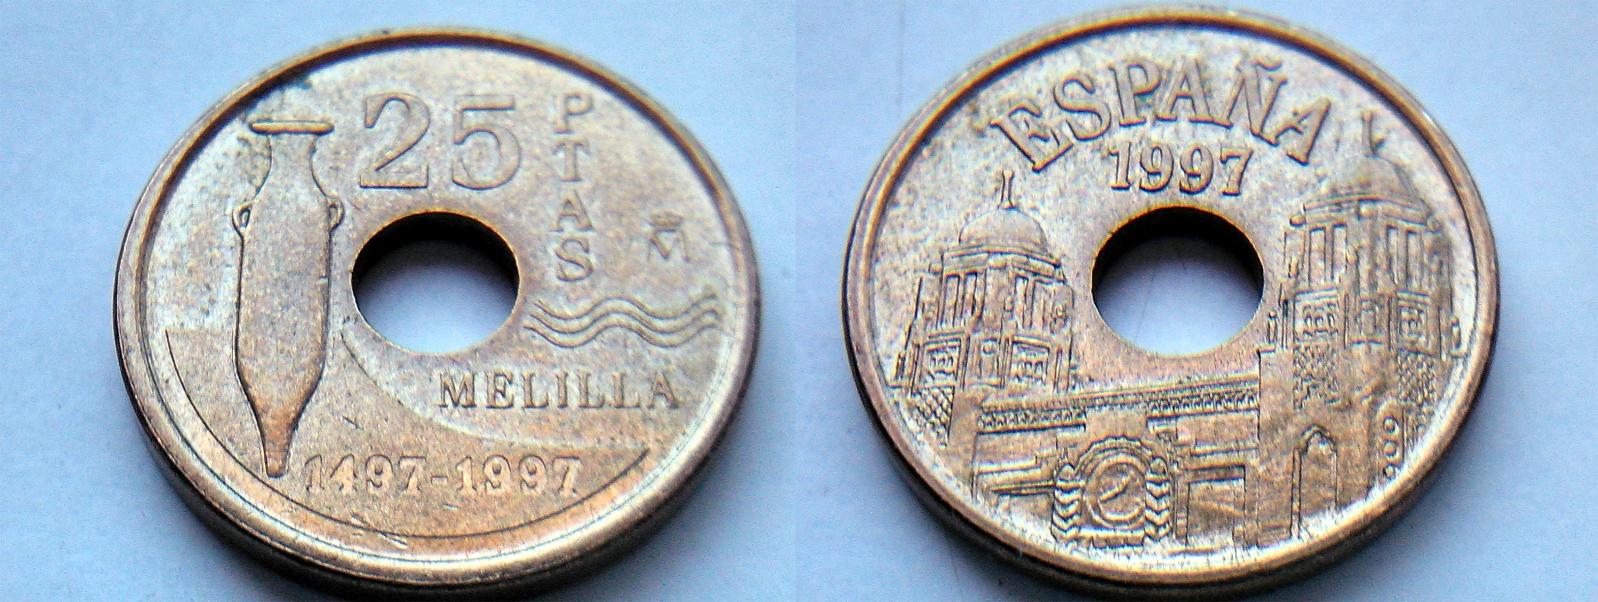 Variante de 25 pesetas Melilla 1997 Juan Carlos I 3sara